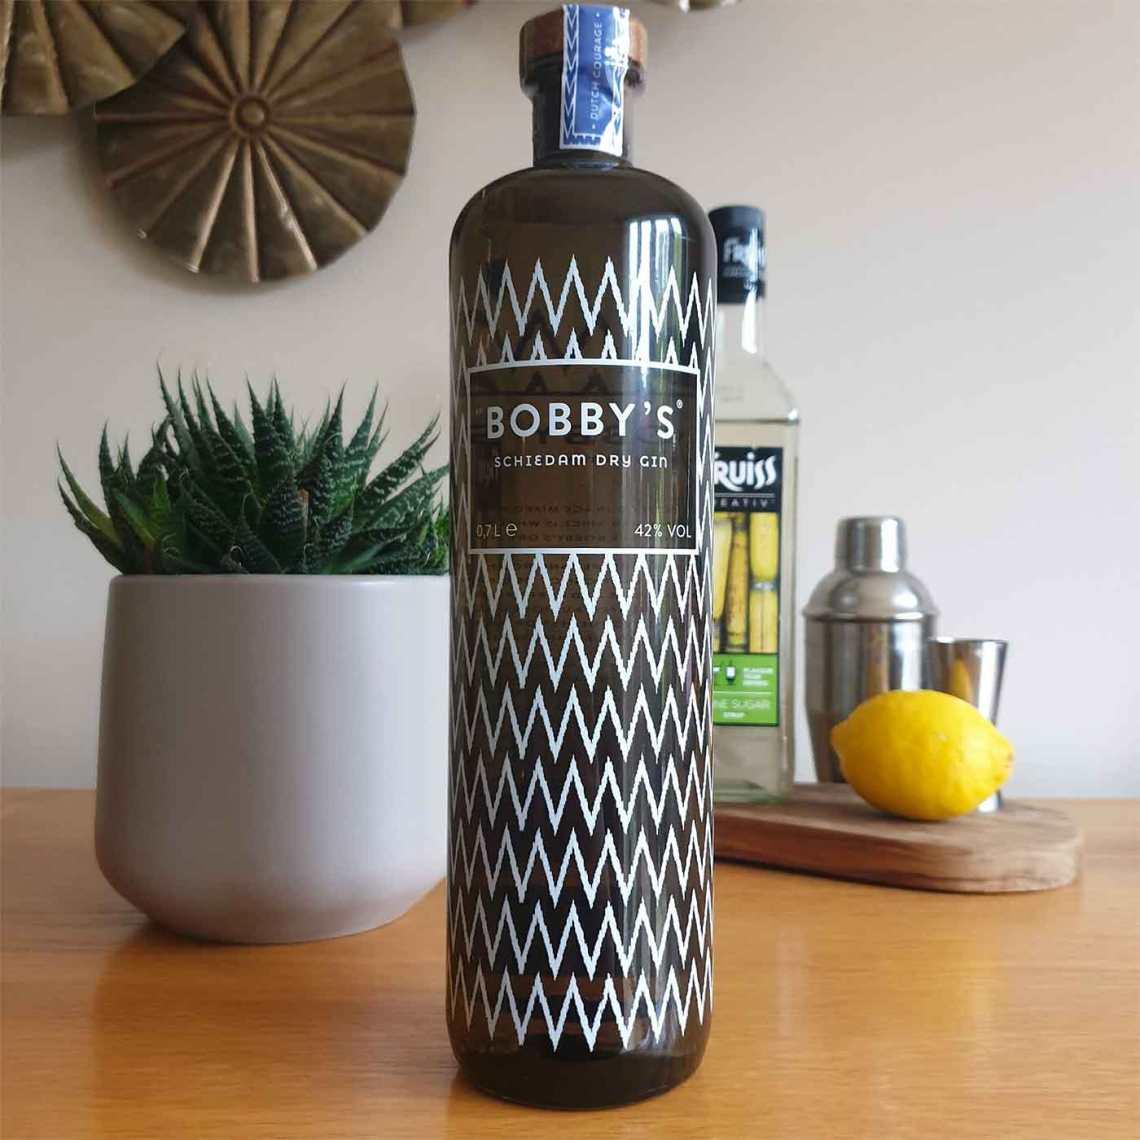 French 75 with Bobby's Schiedam Dry Gin - Female Original